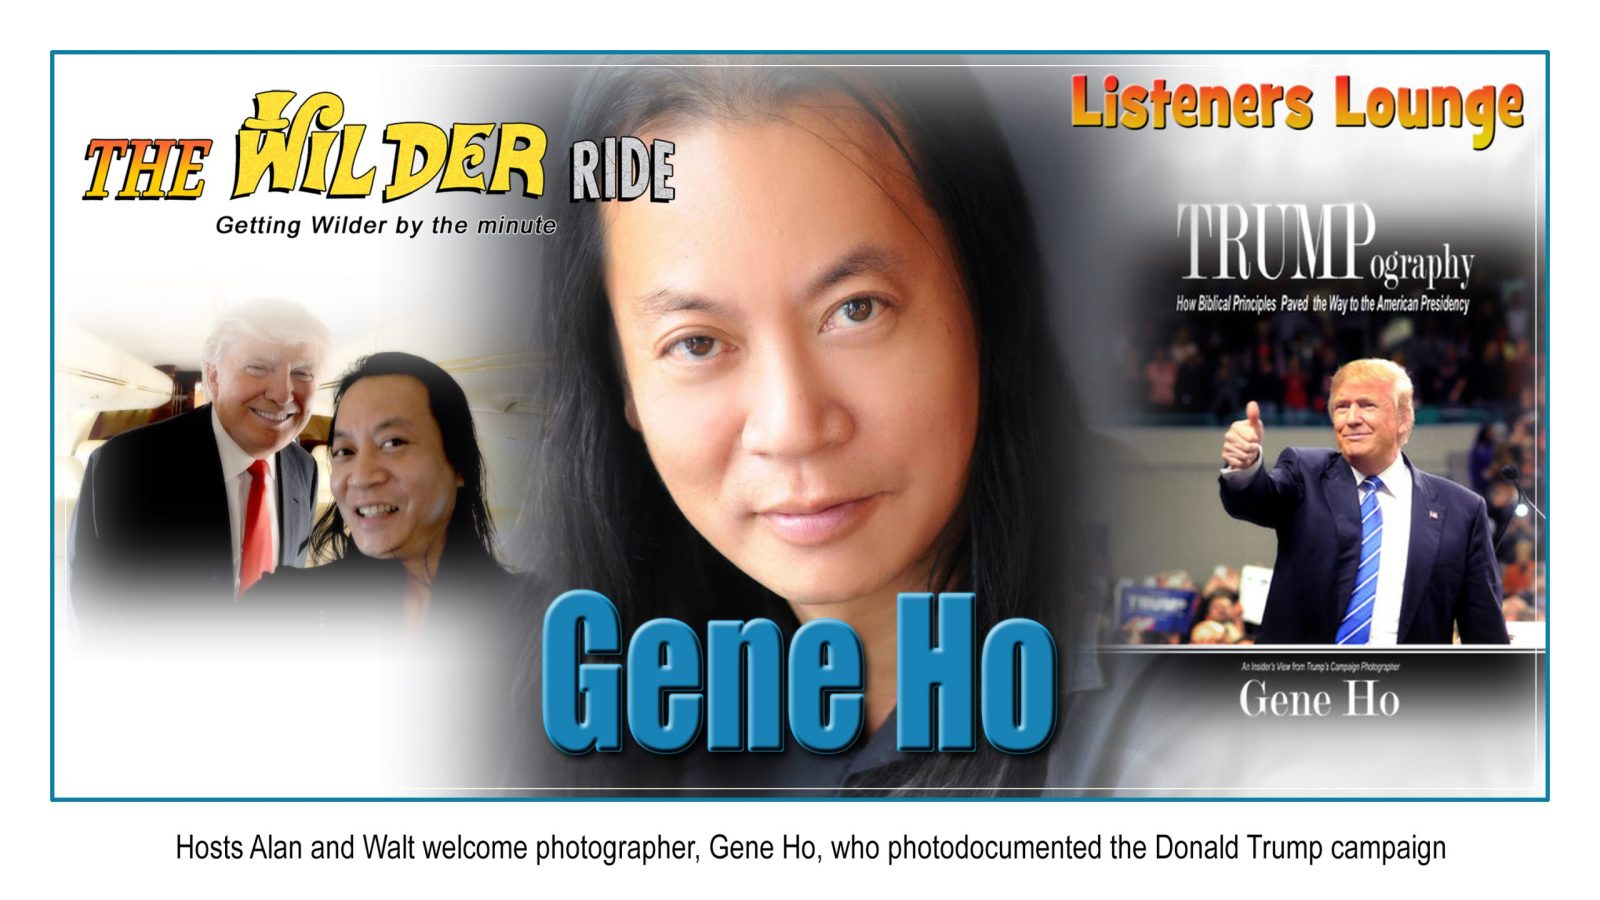 Gene Ho